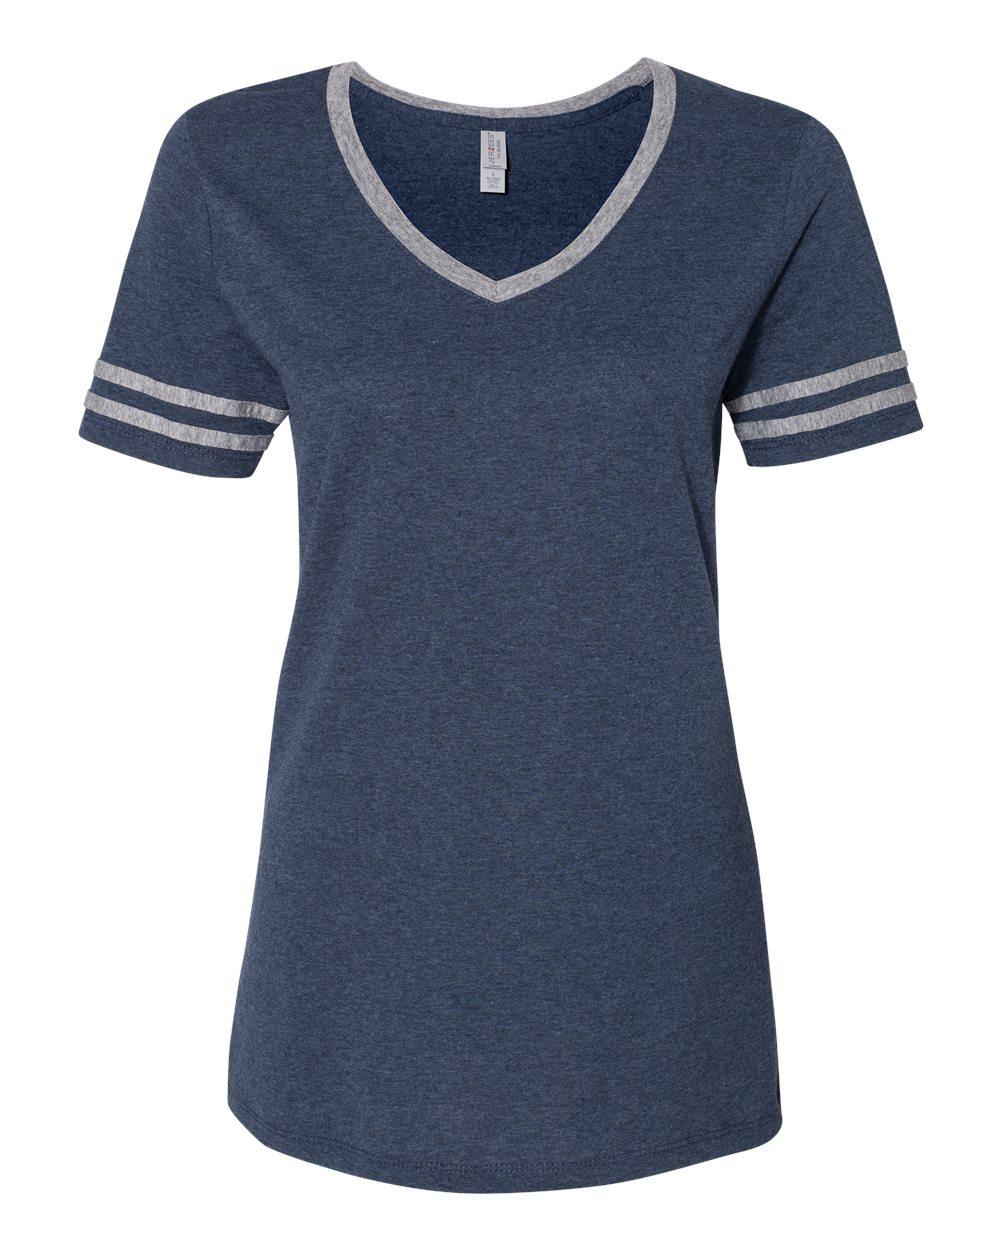 Jerzees-Triblend-Women-039-s-V-Neck-Varsity-T-Shirt-602WVR thumbnail 17